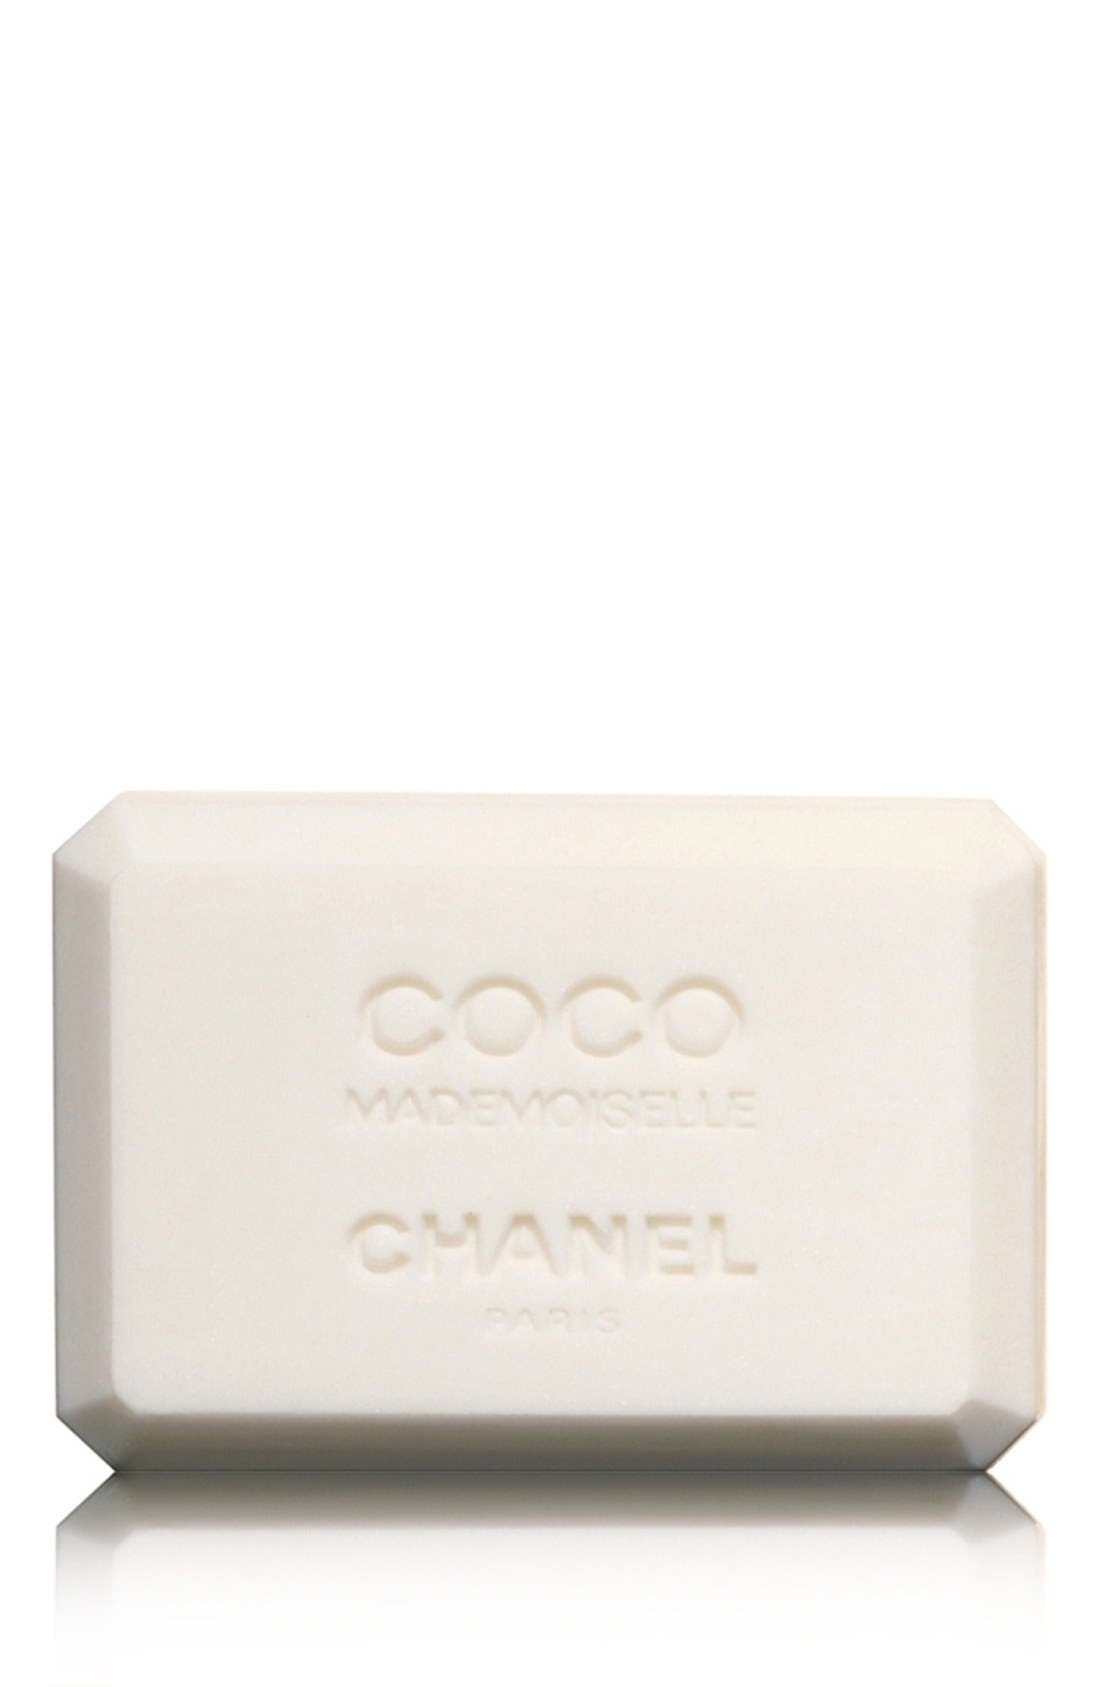 CHANEL COCO MADEMOISELLE  Fresh Bath Soap